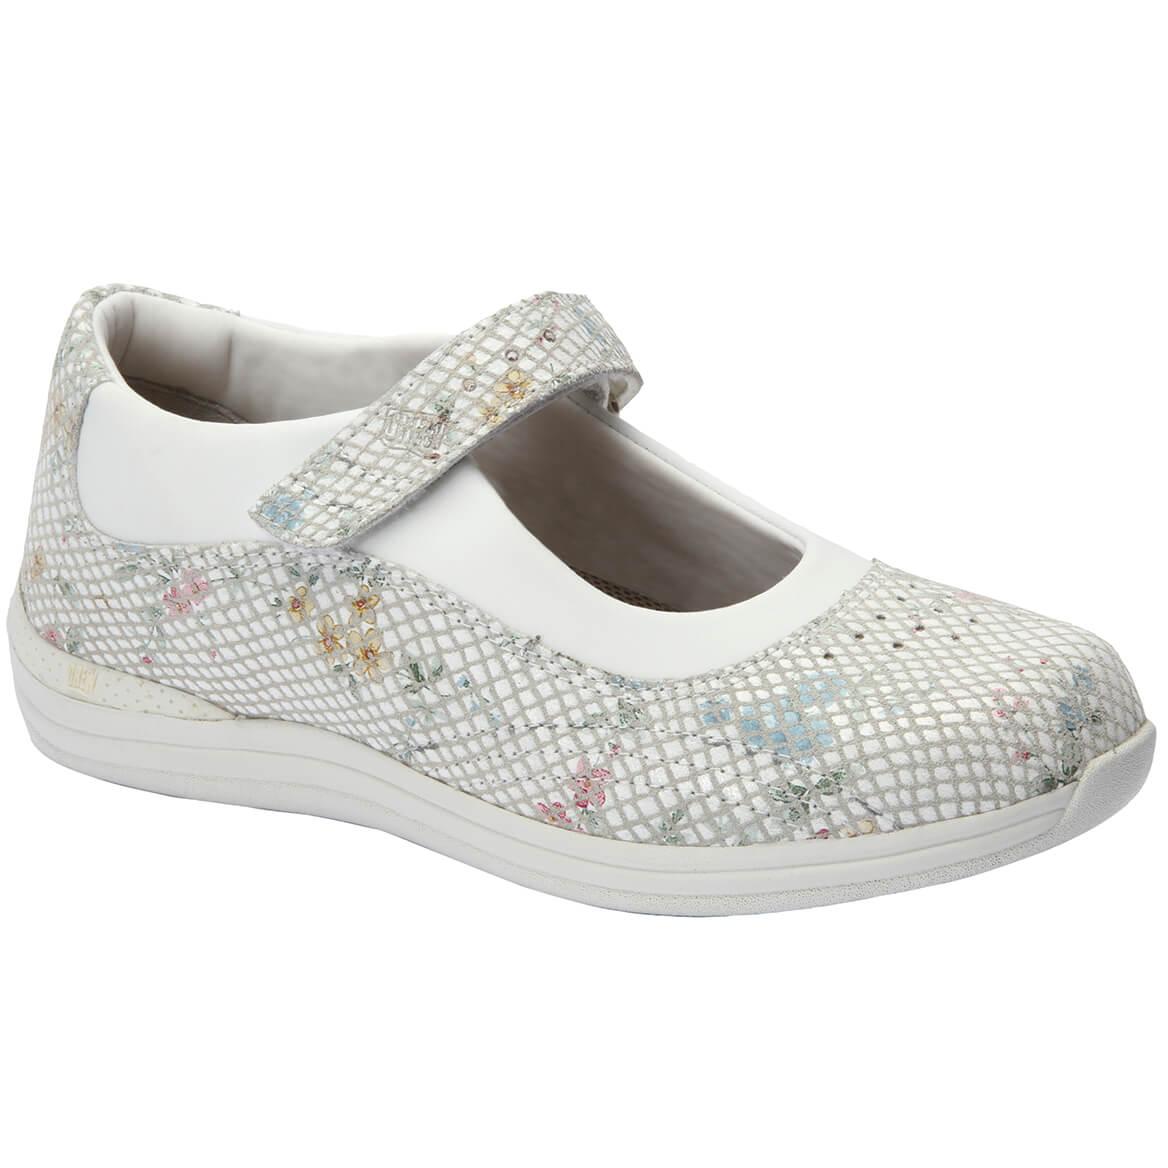 Drew® Rose Women's Mary Jane Shoe - RTV-369134